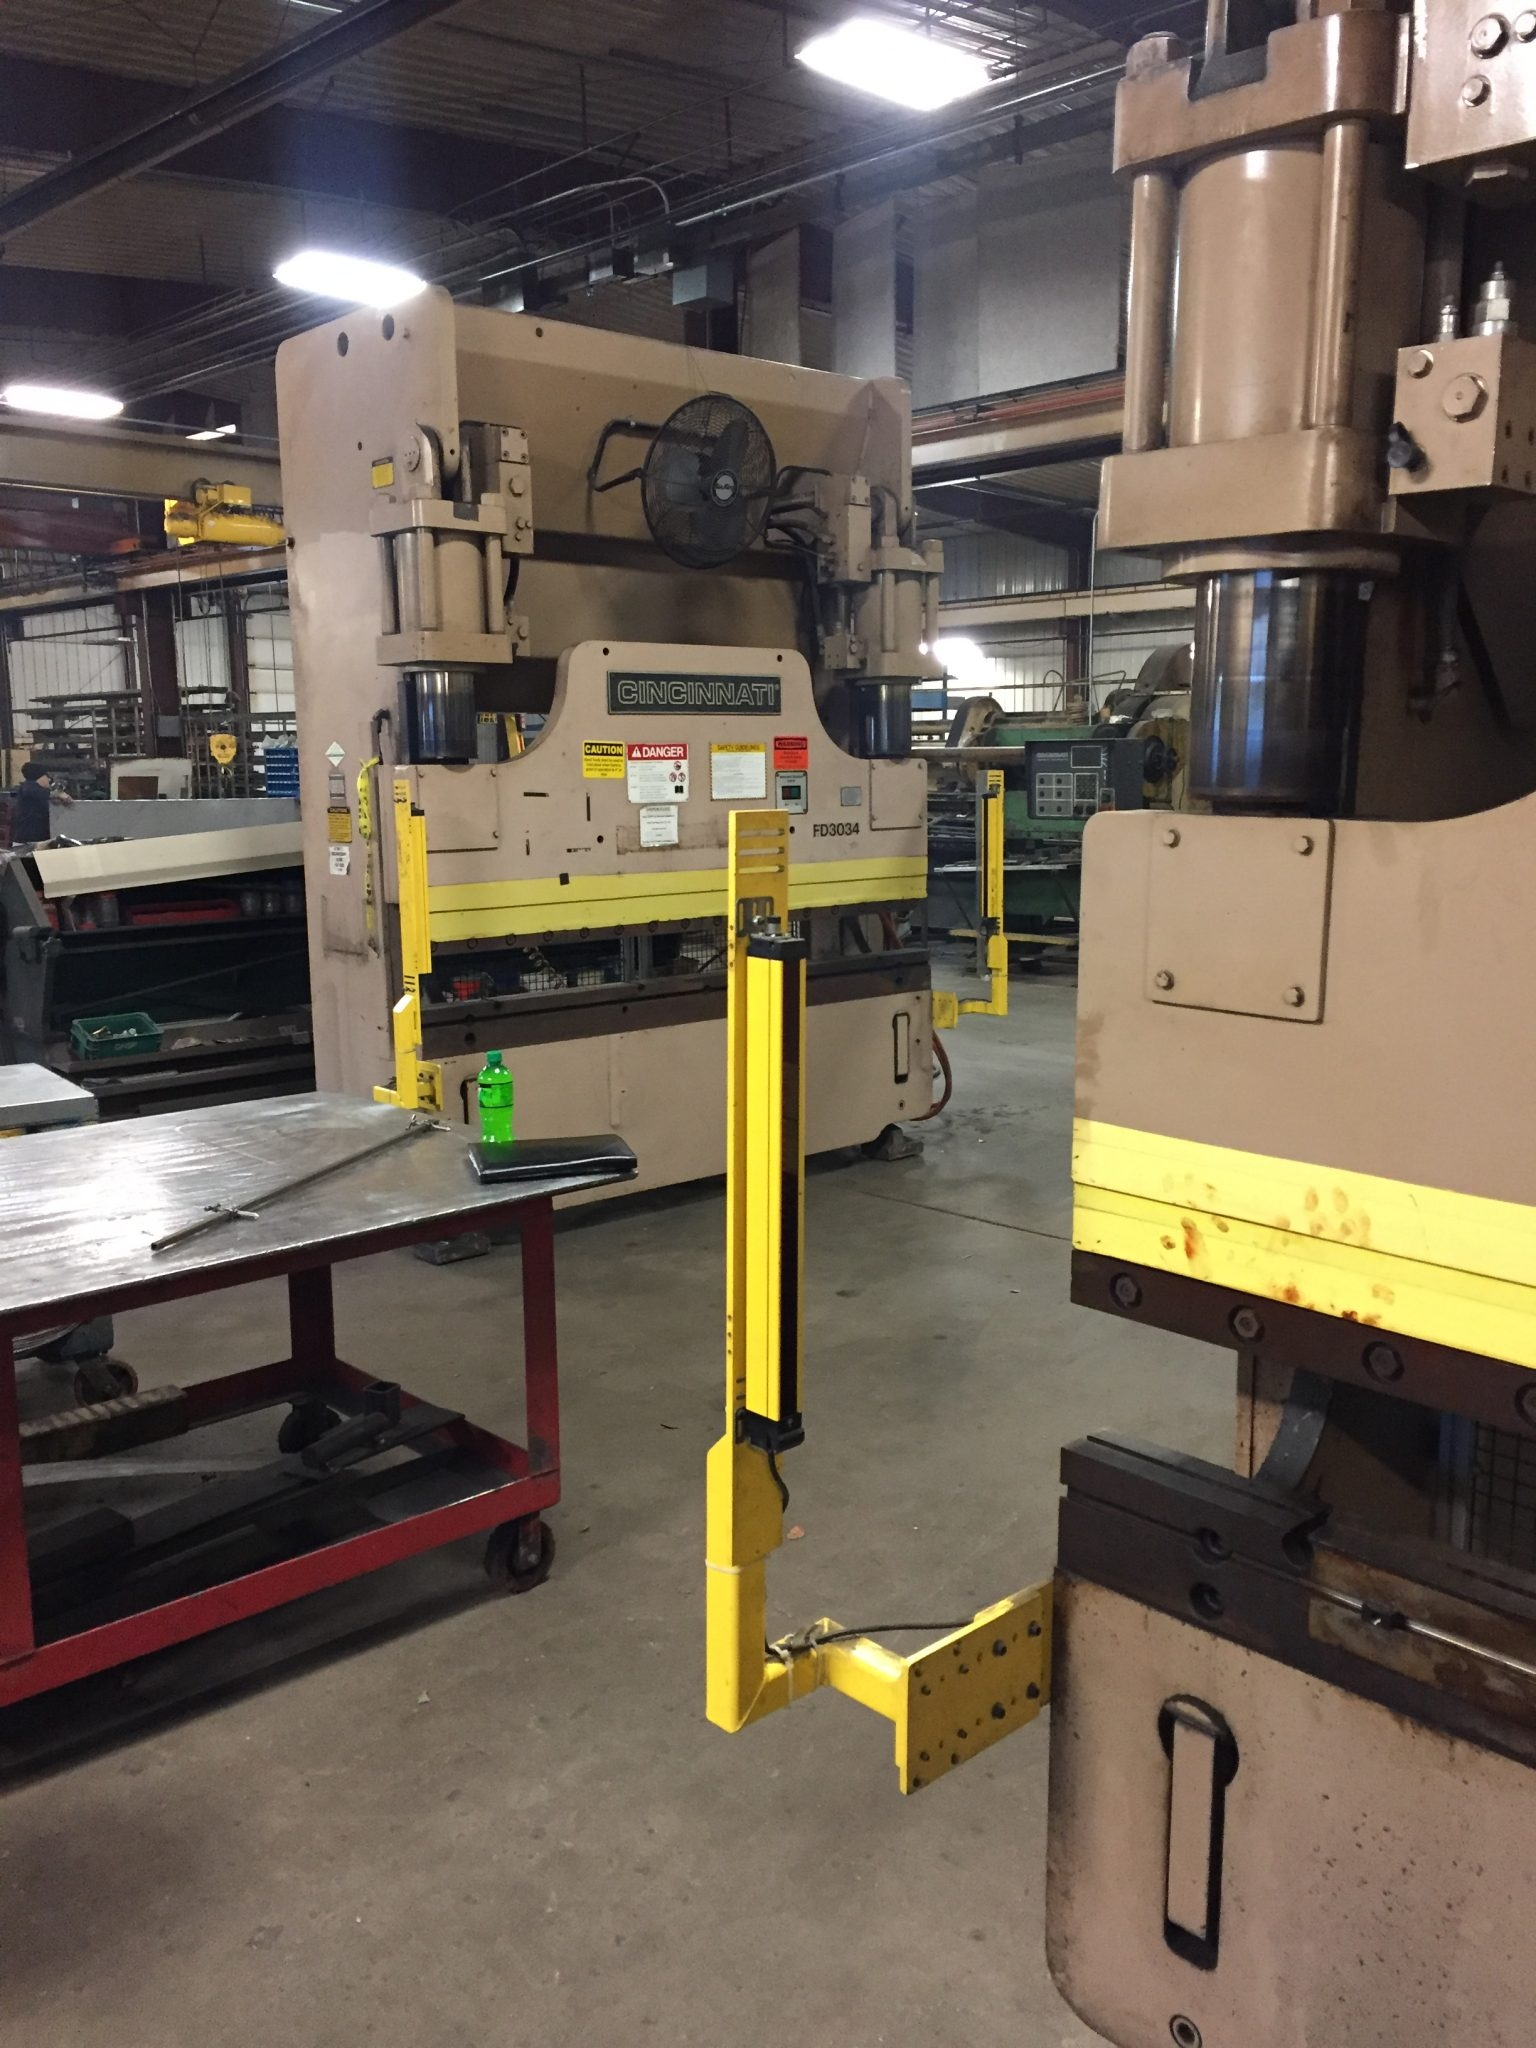 135 Ton Cincinnati Press Brake For Sale 8' Overall | Call